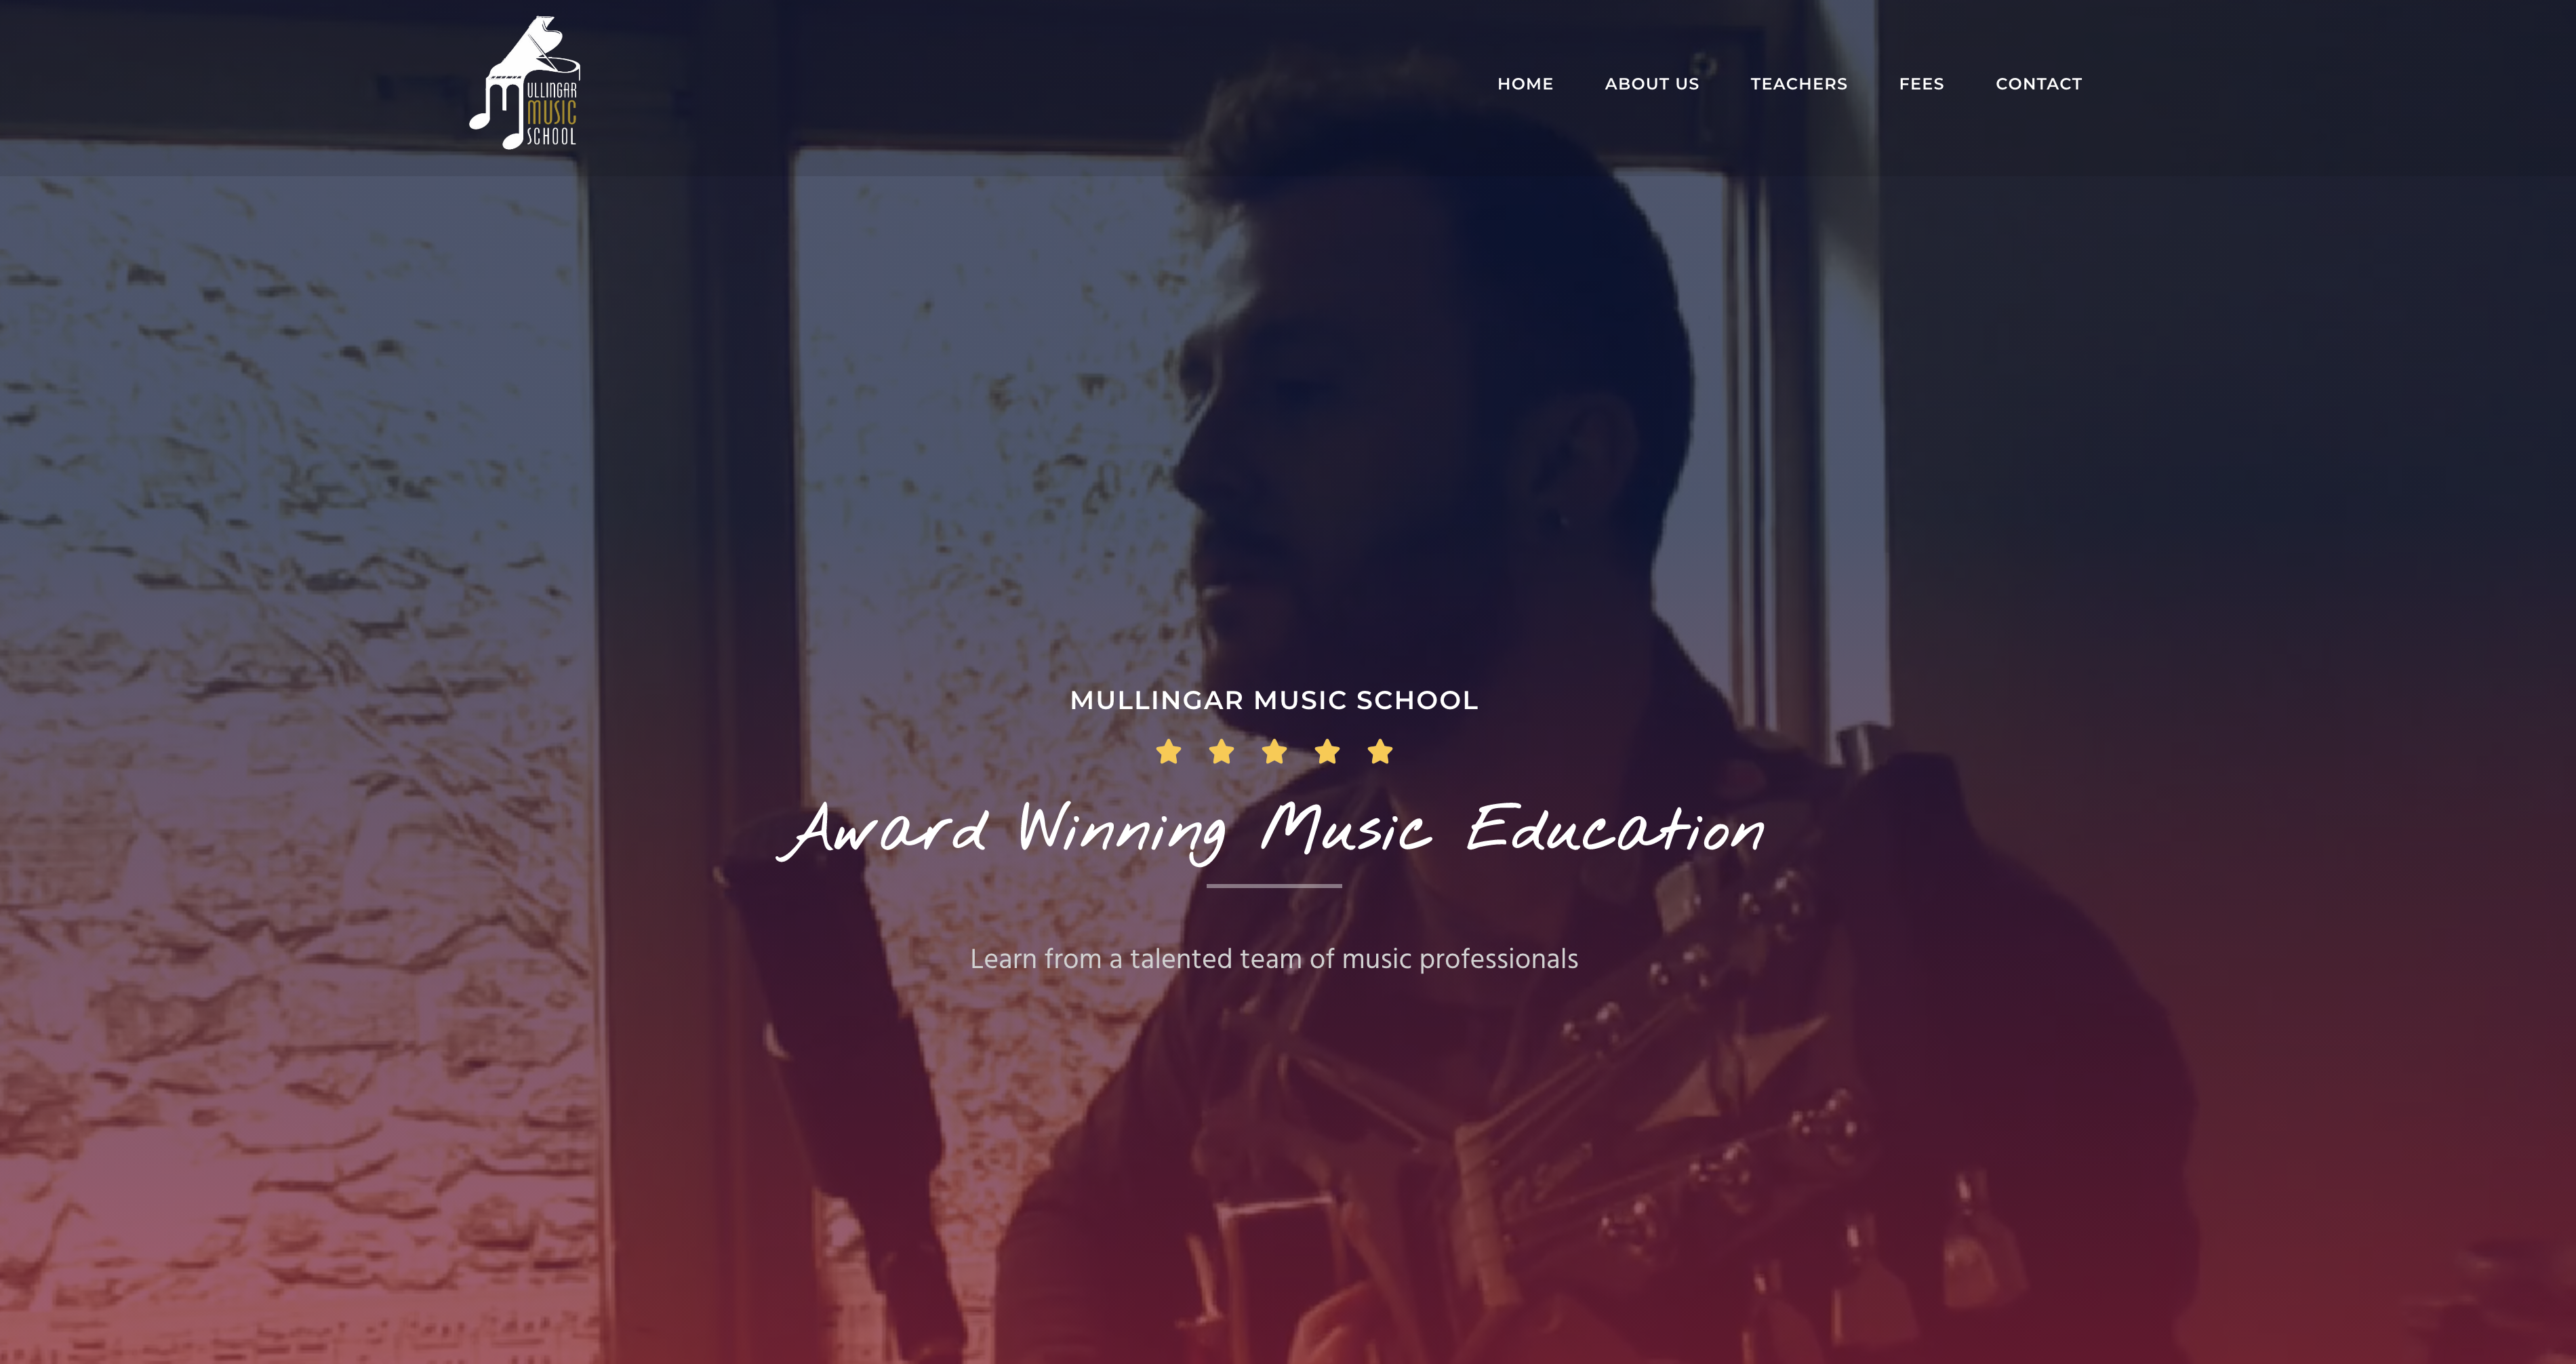 Mullingar Music School